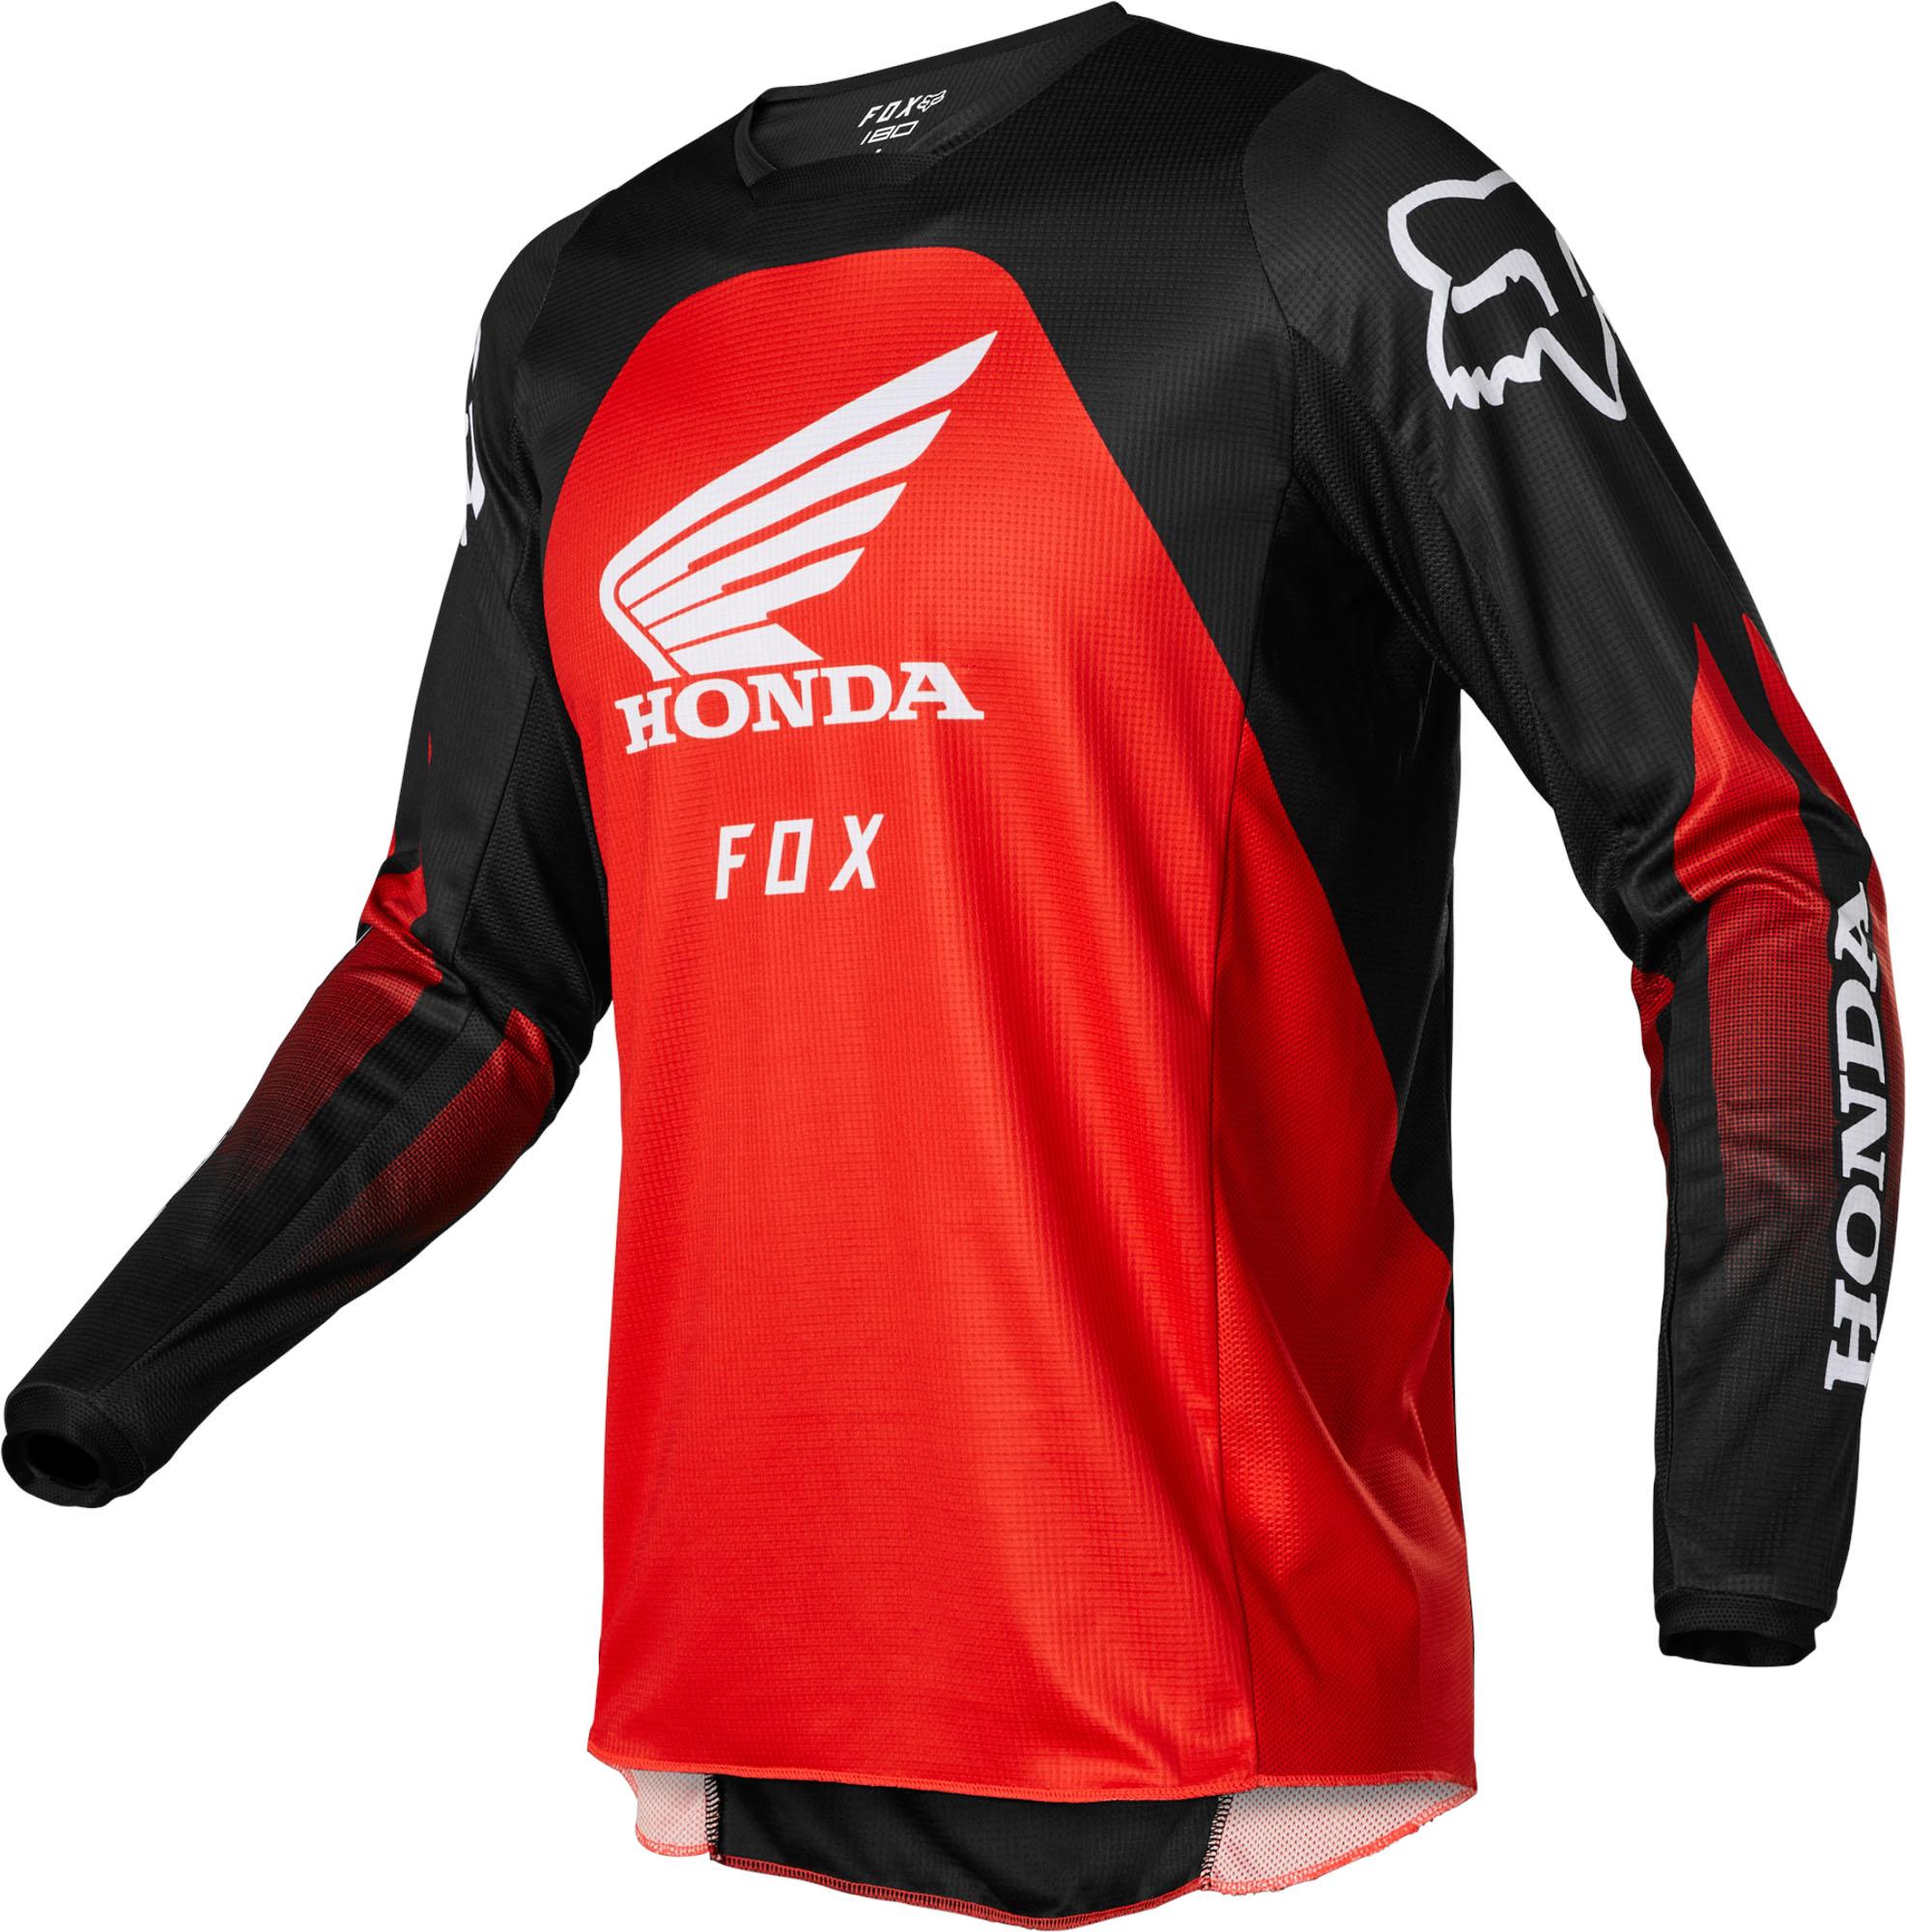 FOX 180 Honda Jersey - BLACK/RED MX22